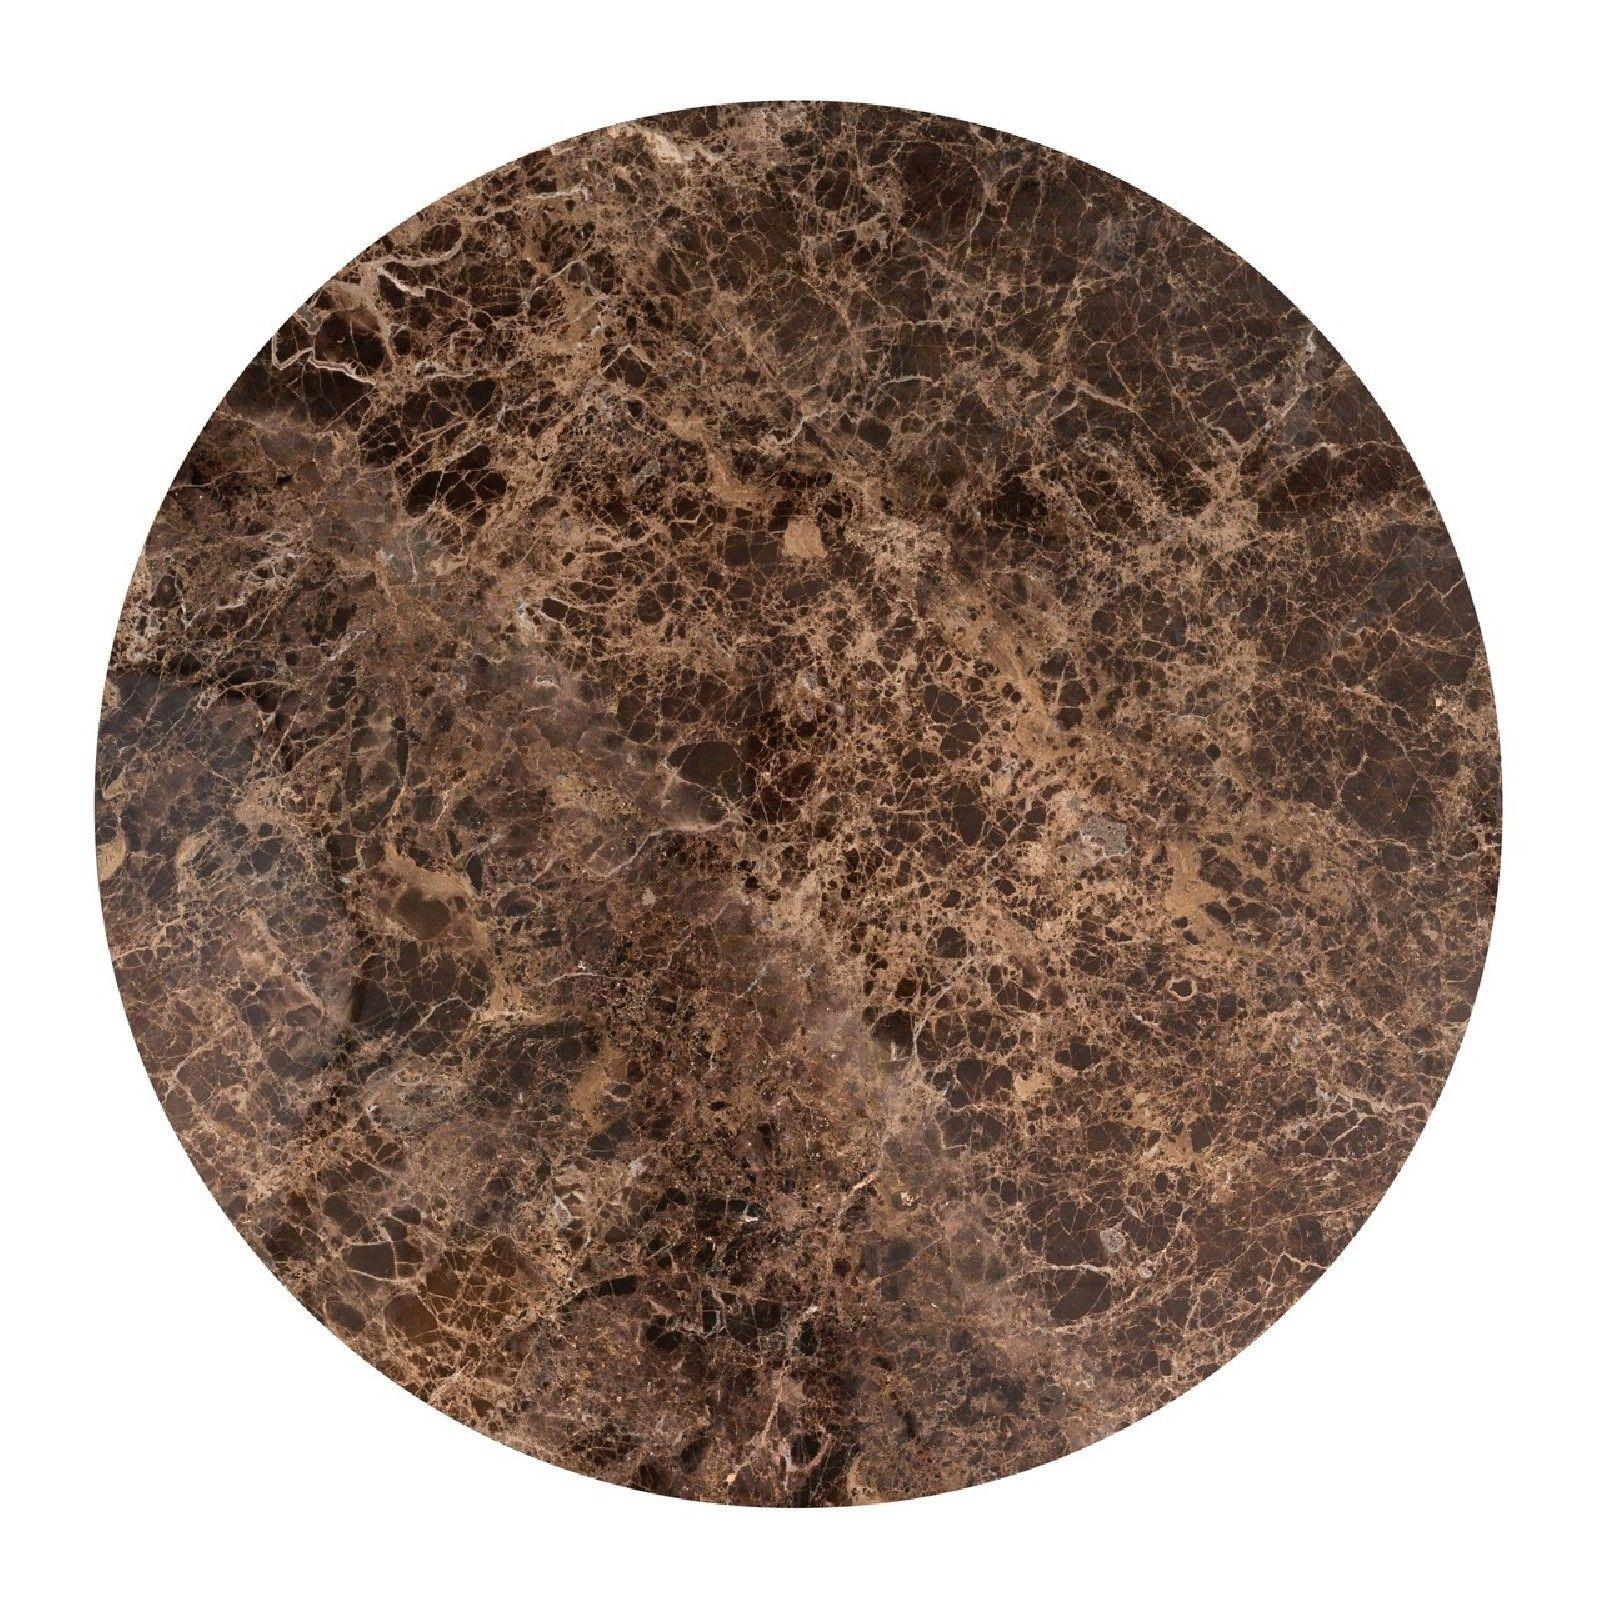 Table à dîner Dalton brown emperador rond 130Ø Meuble Déco Tendance - 838